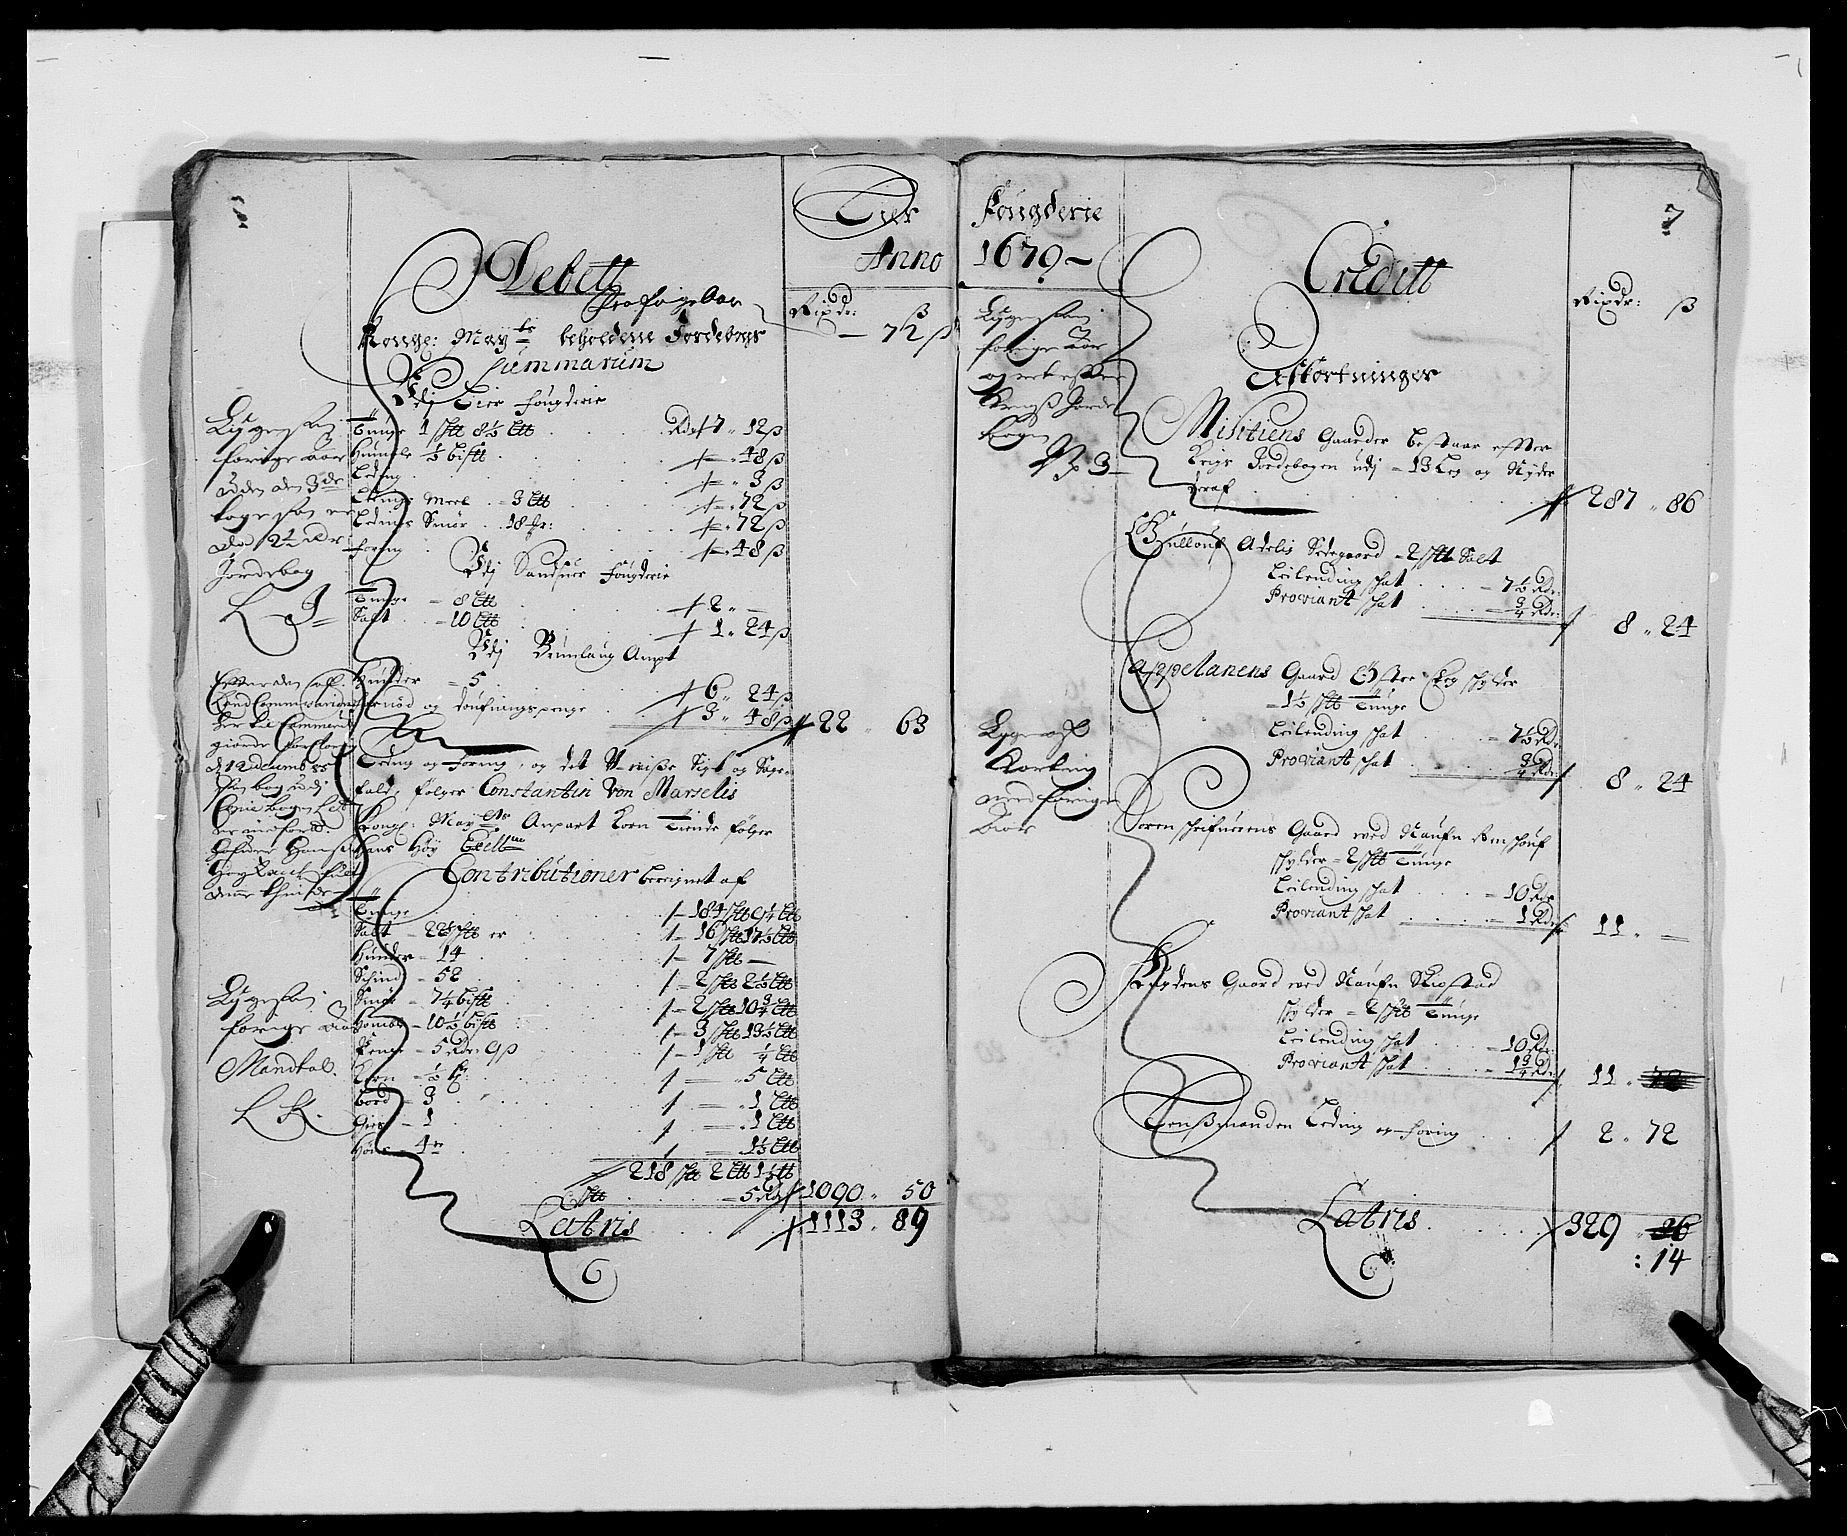 RA, Rentekammeret inntil 1814, Reviderte regnskaper, Fogderegnskap, R27/L1686: Fogderegnskap Lier, 1678-1686, s. 9